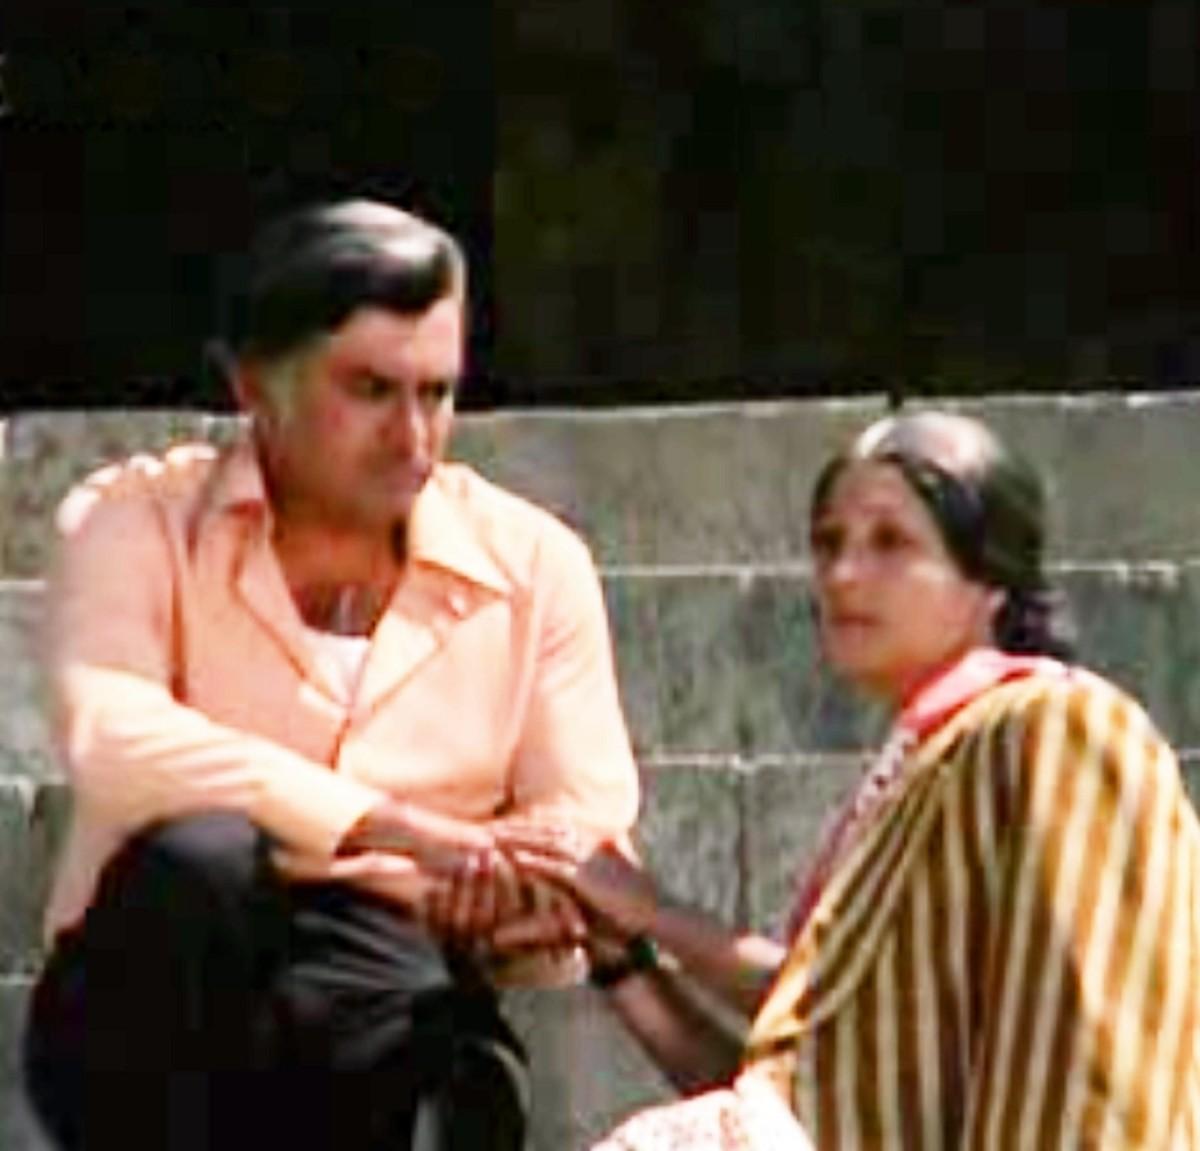 One of the greatest musical pieces heard in Bollywood, by Kishore Kumar & Lata Mangeshkar